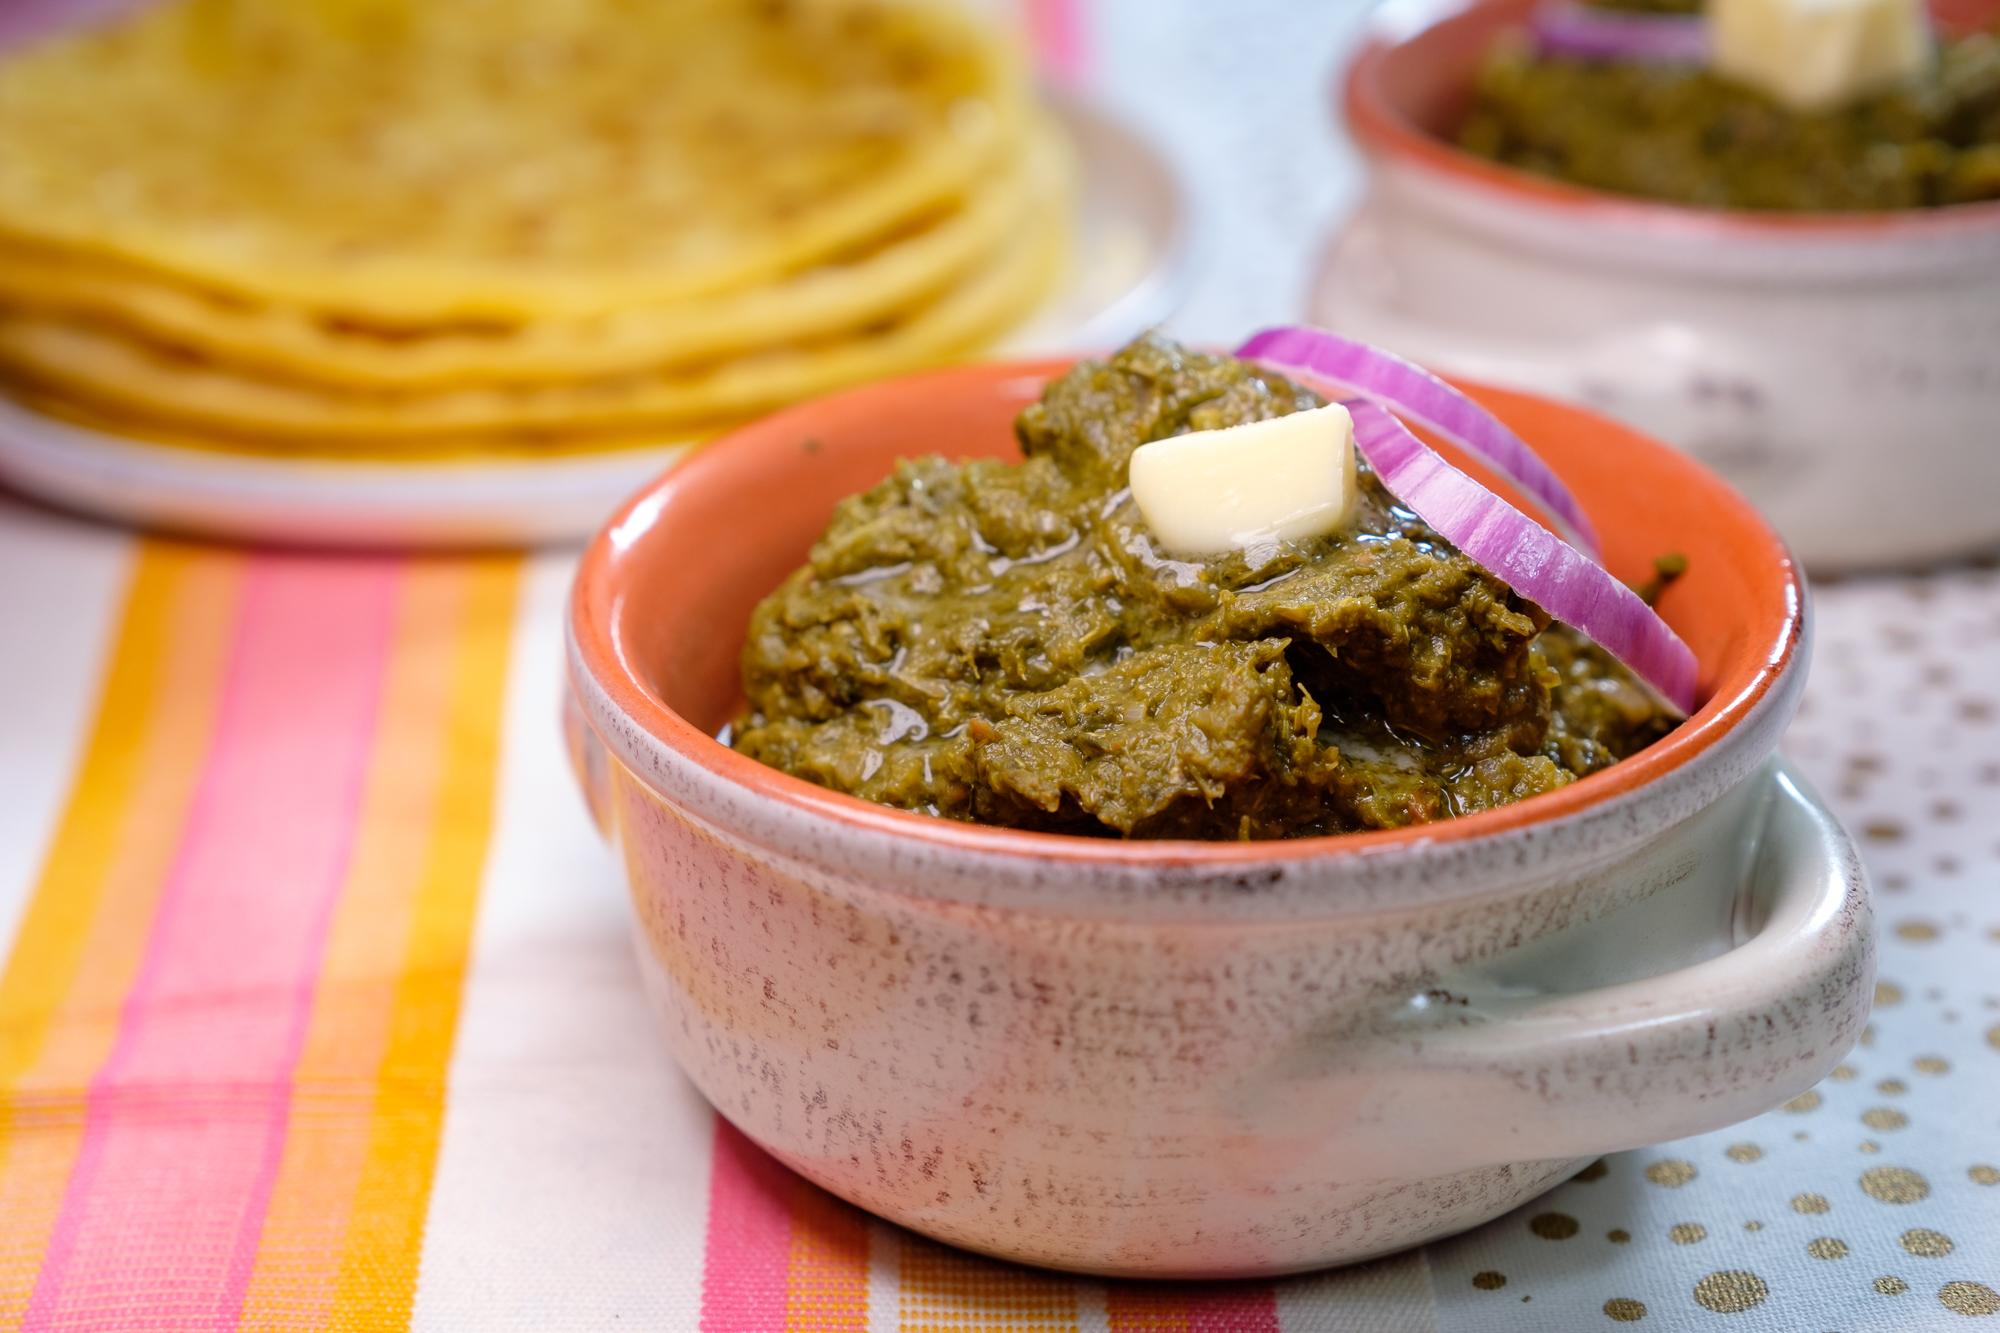 Lohri traditions, how to celebrate lohri